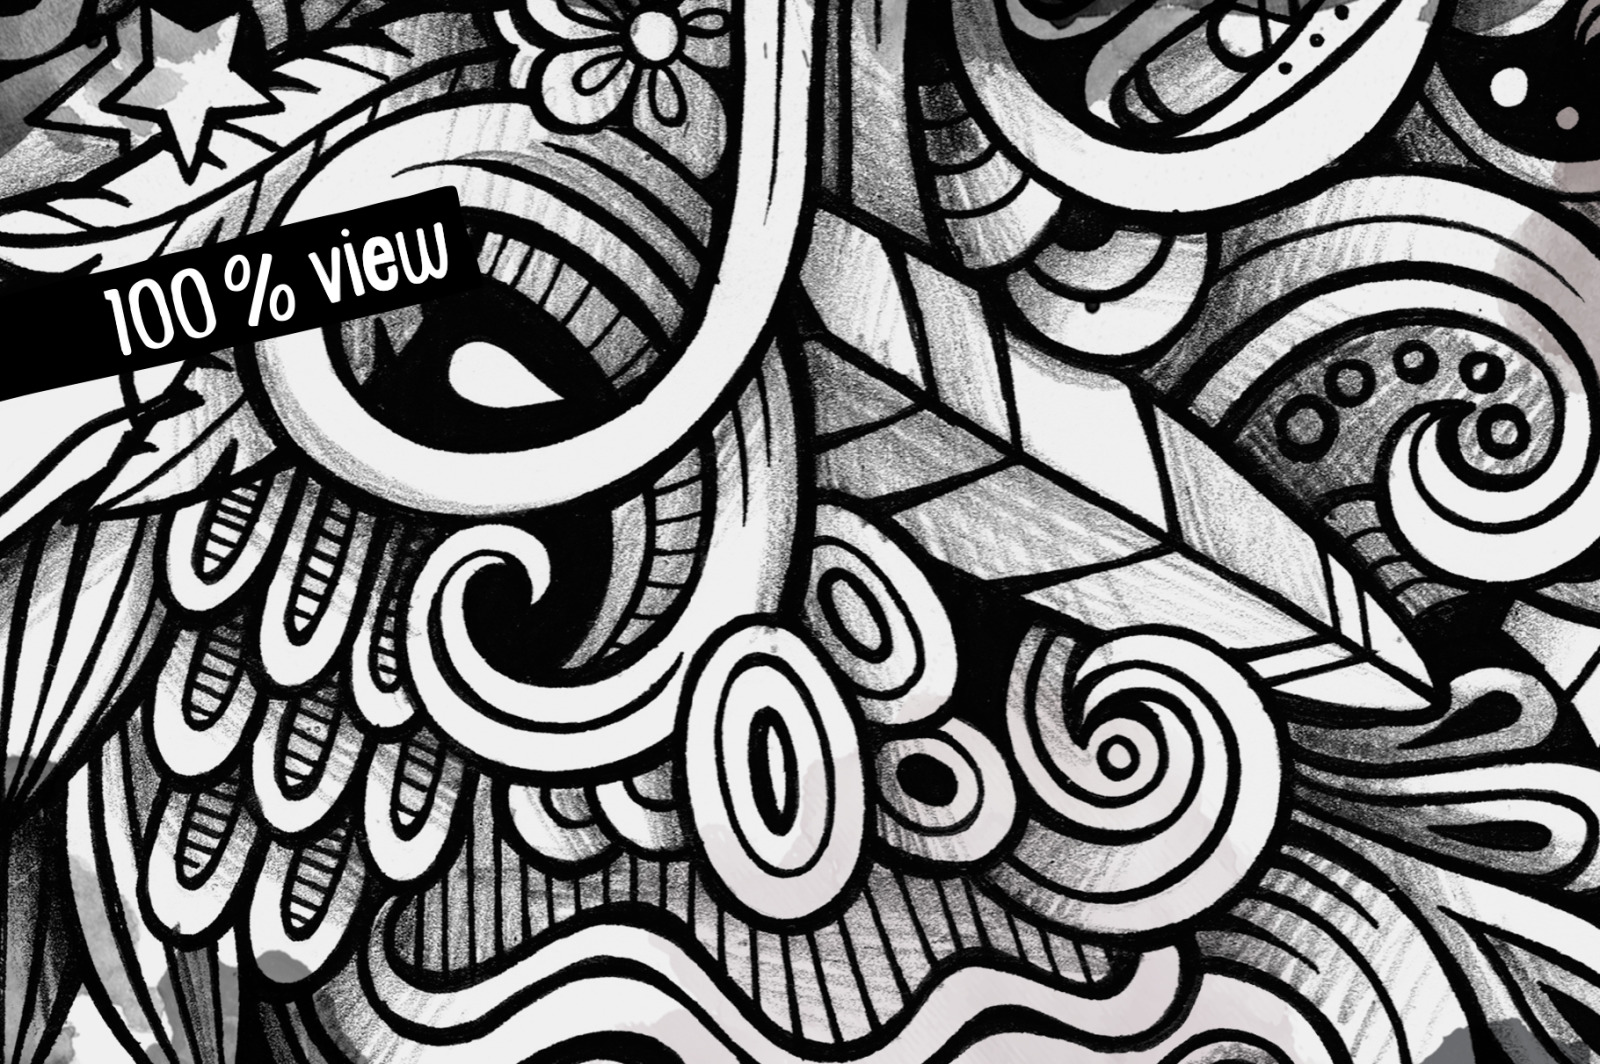 Hippie Graphic Doodle Illustration